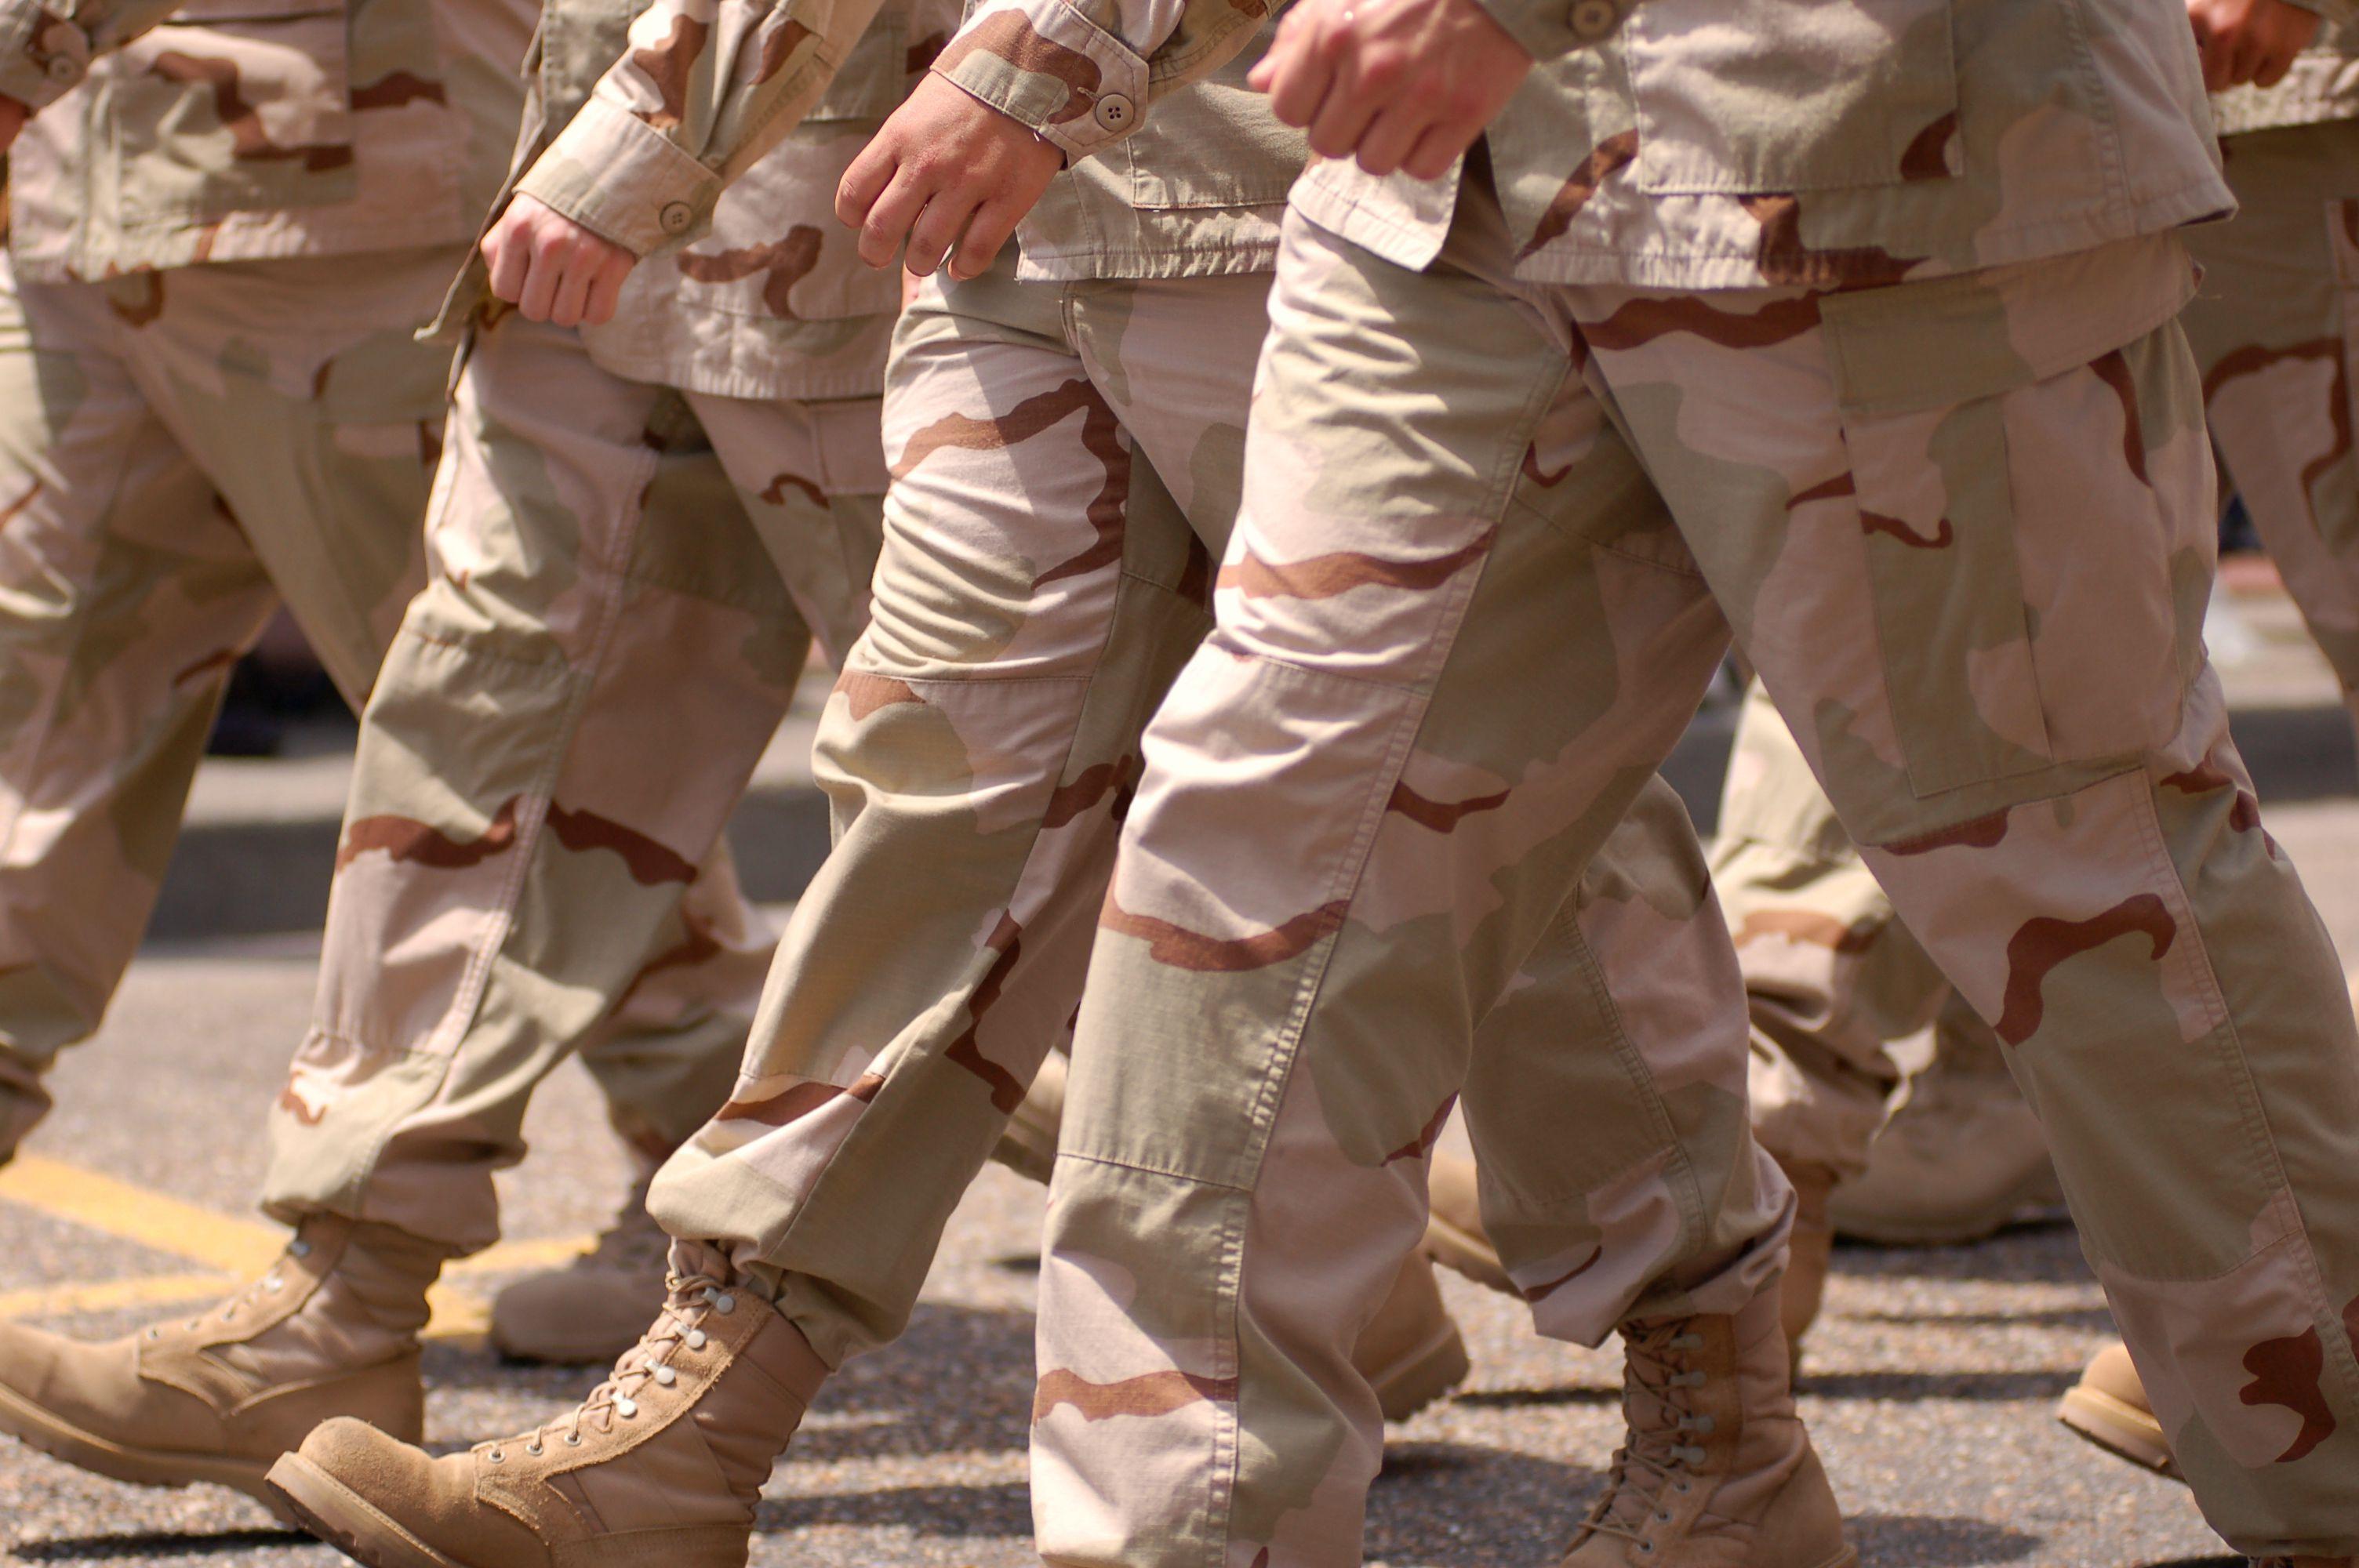 Gulf War Syndrome in Fibromyalgia and ME/CFS